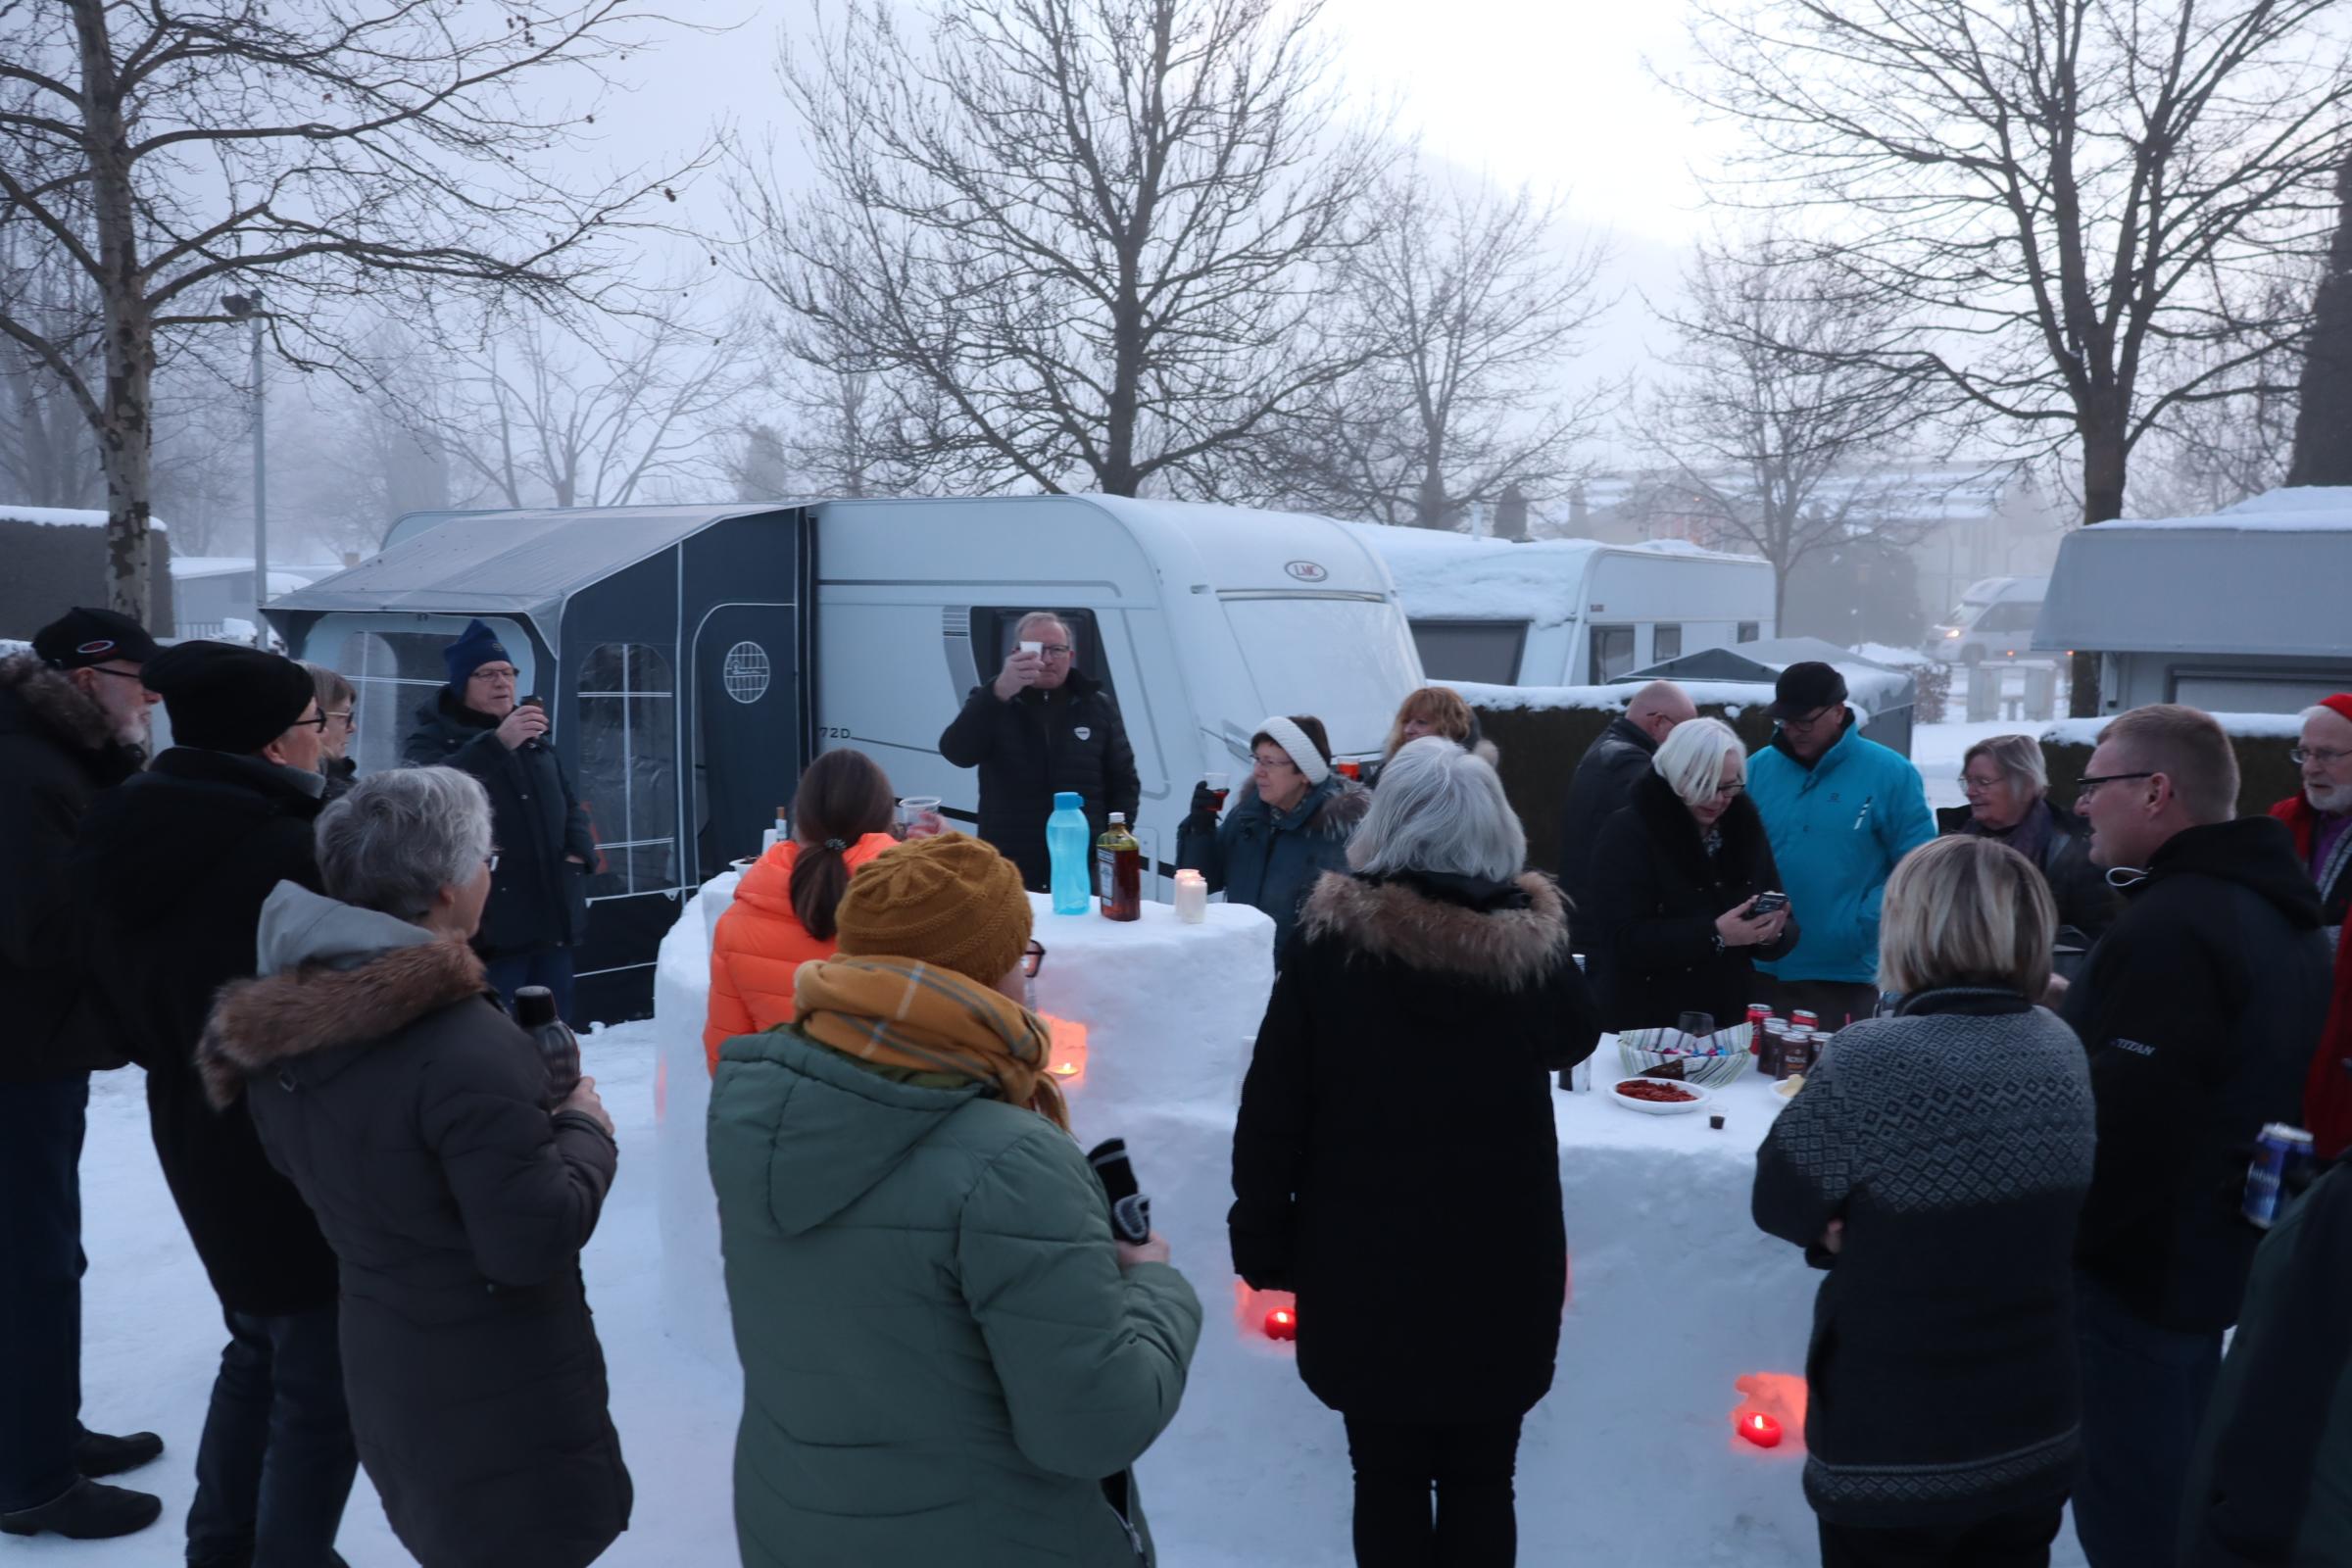 Vintercamping i Østrig - Del 2 (Reklame)